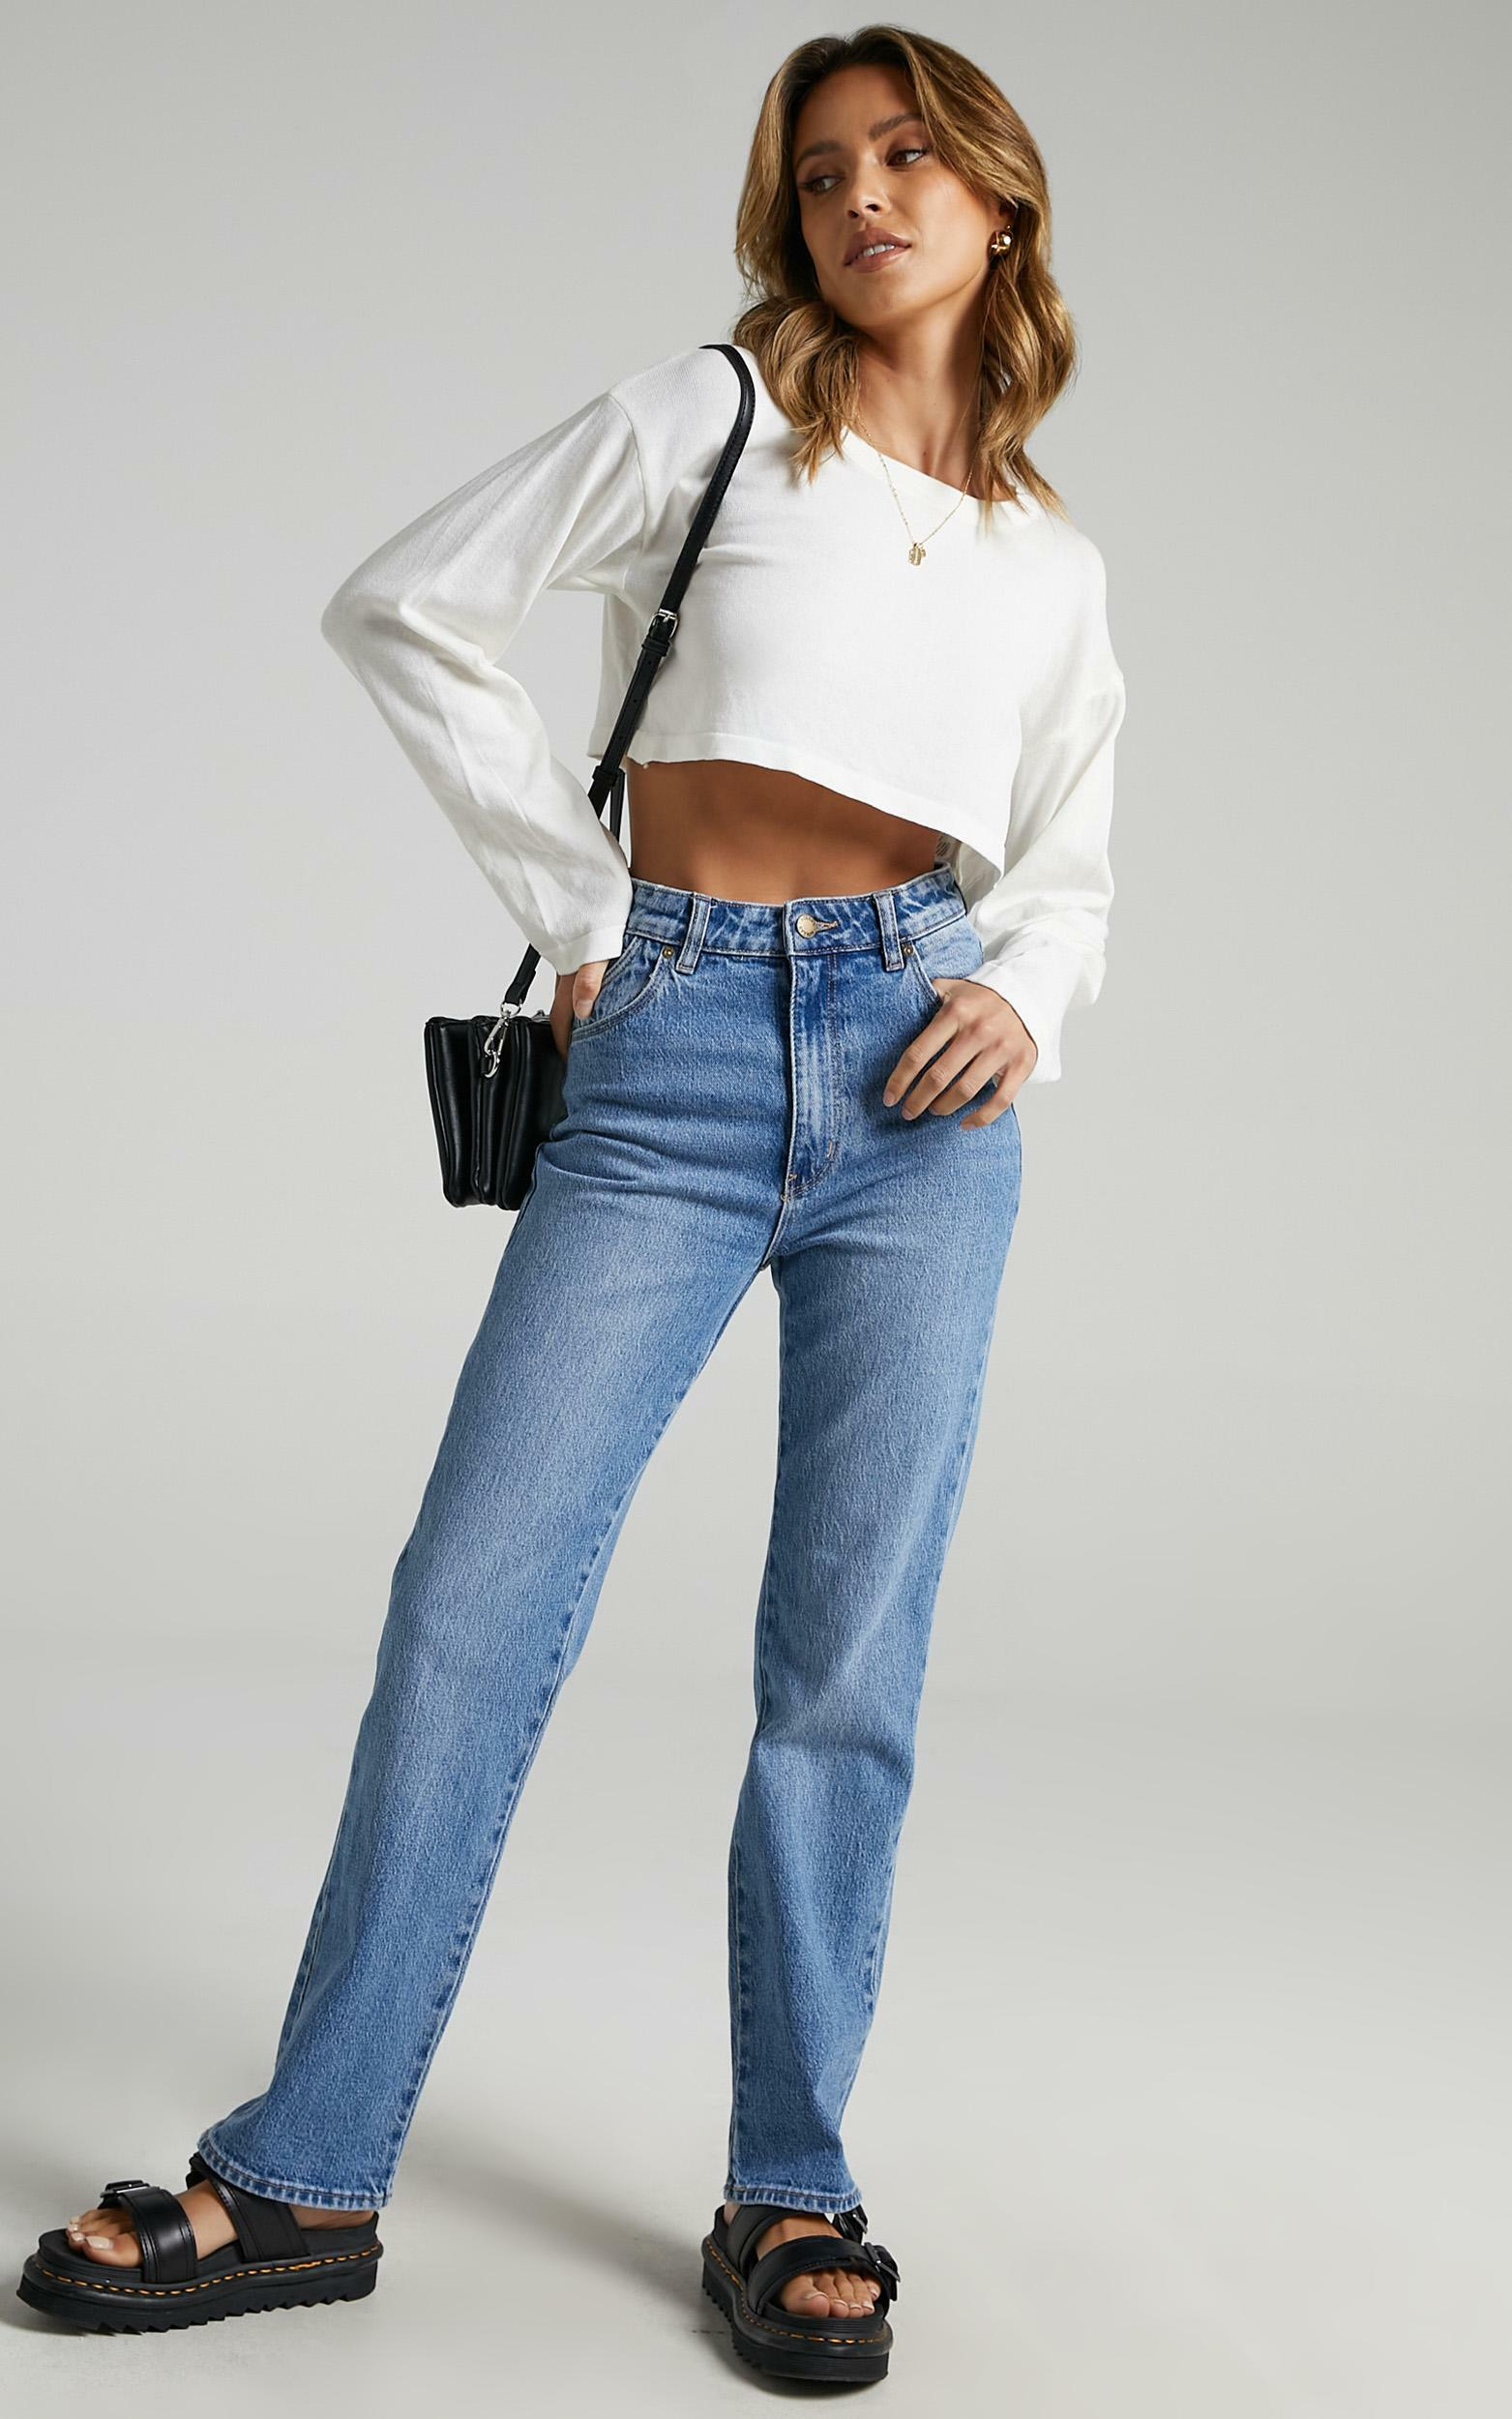 Rollas - Original Straight Jean in Brad Blue - 10, BLU1, hi-res image number null